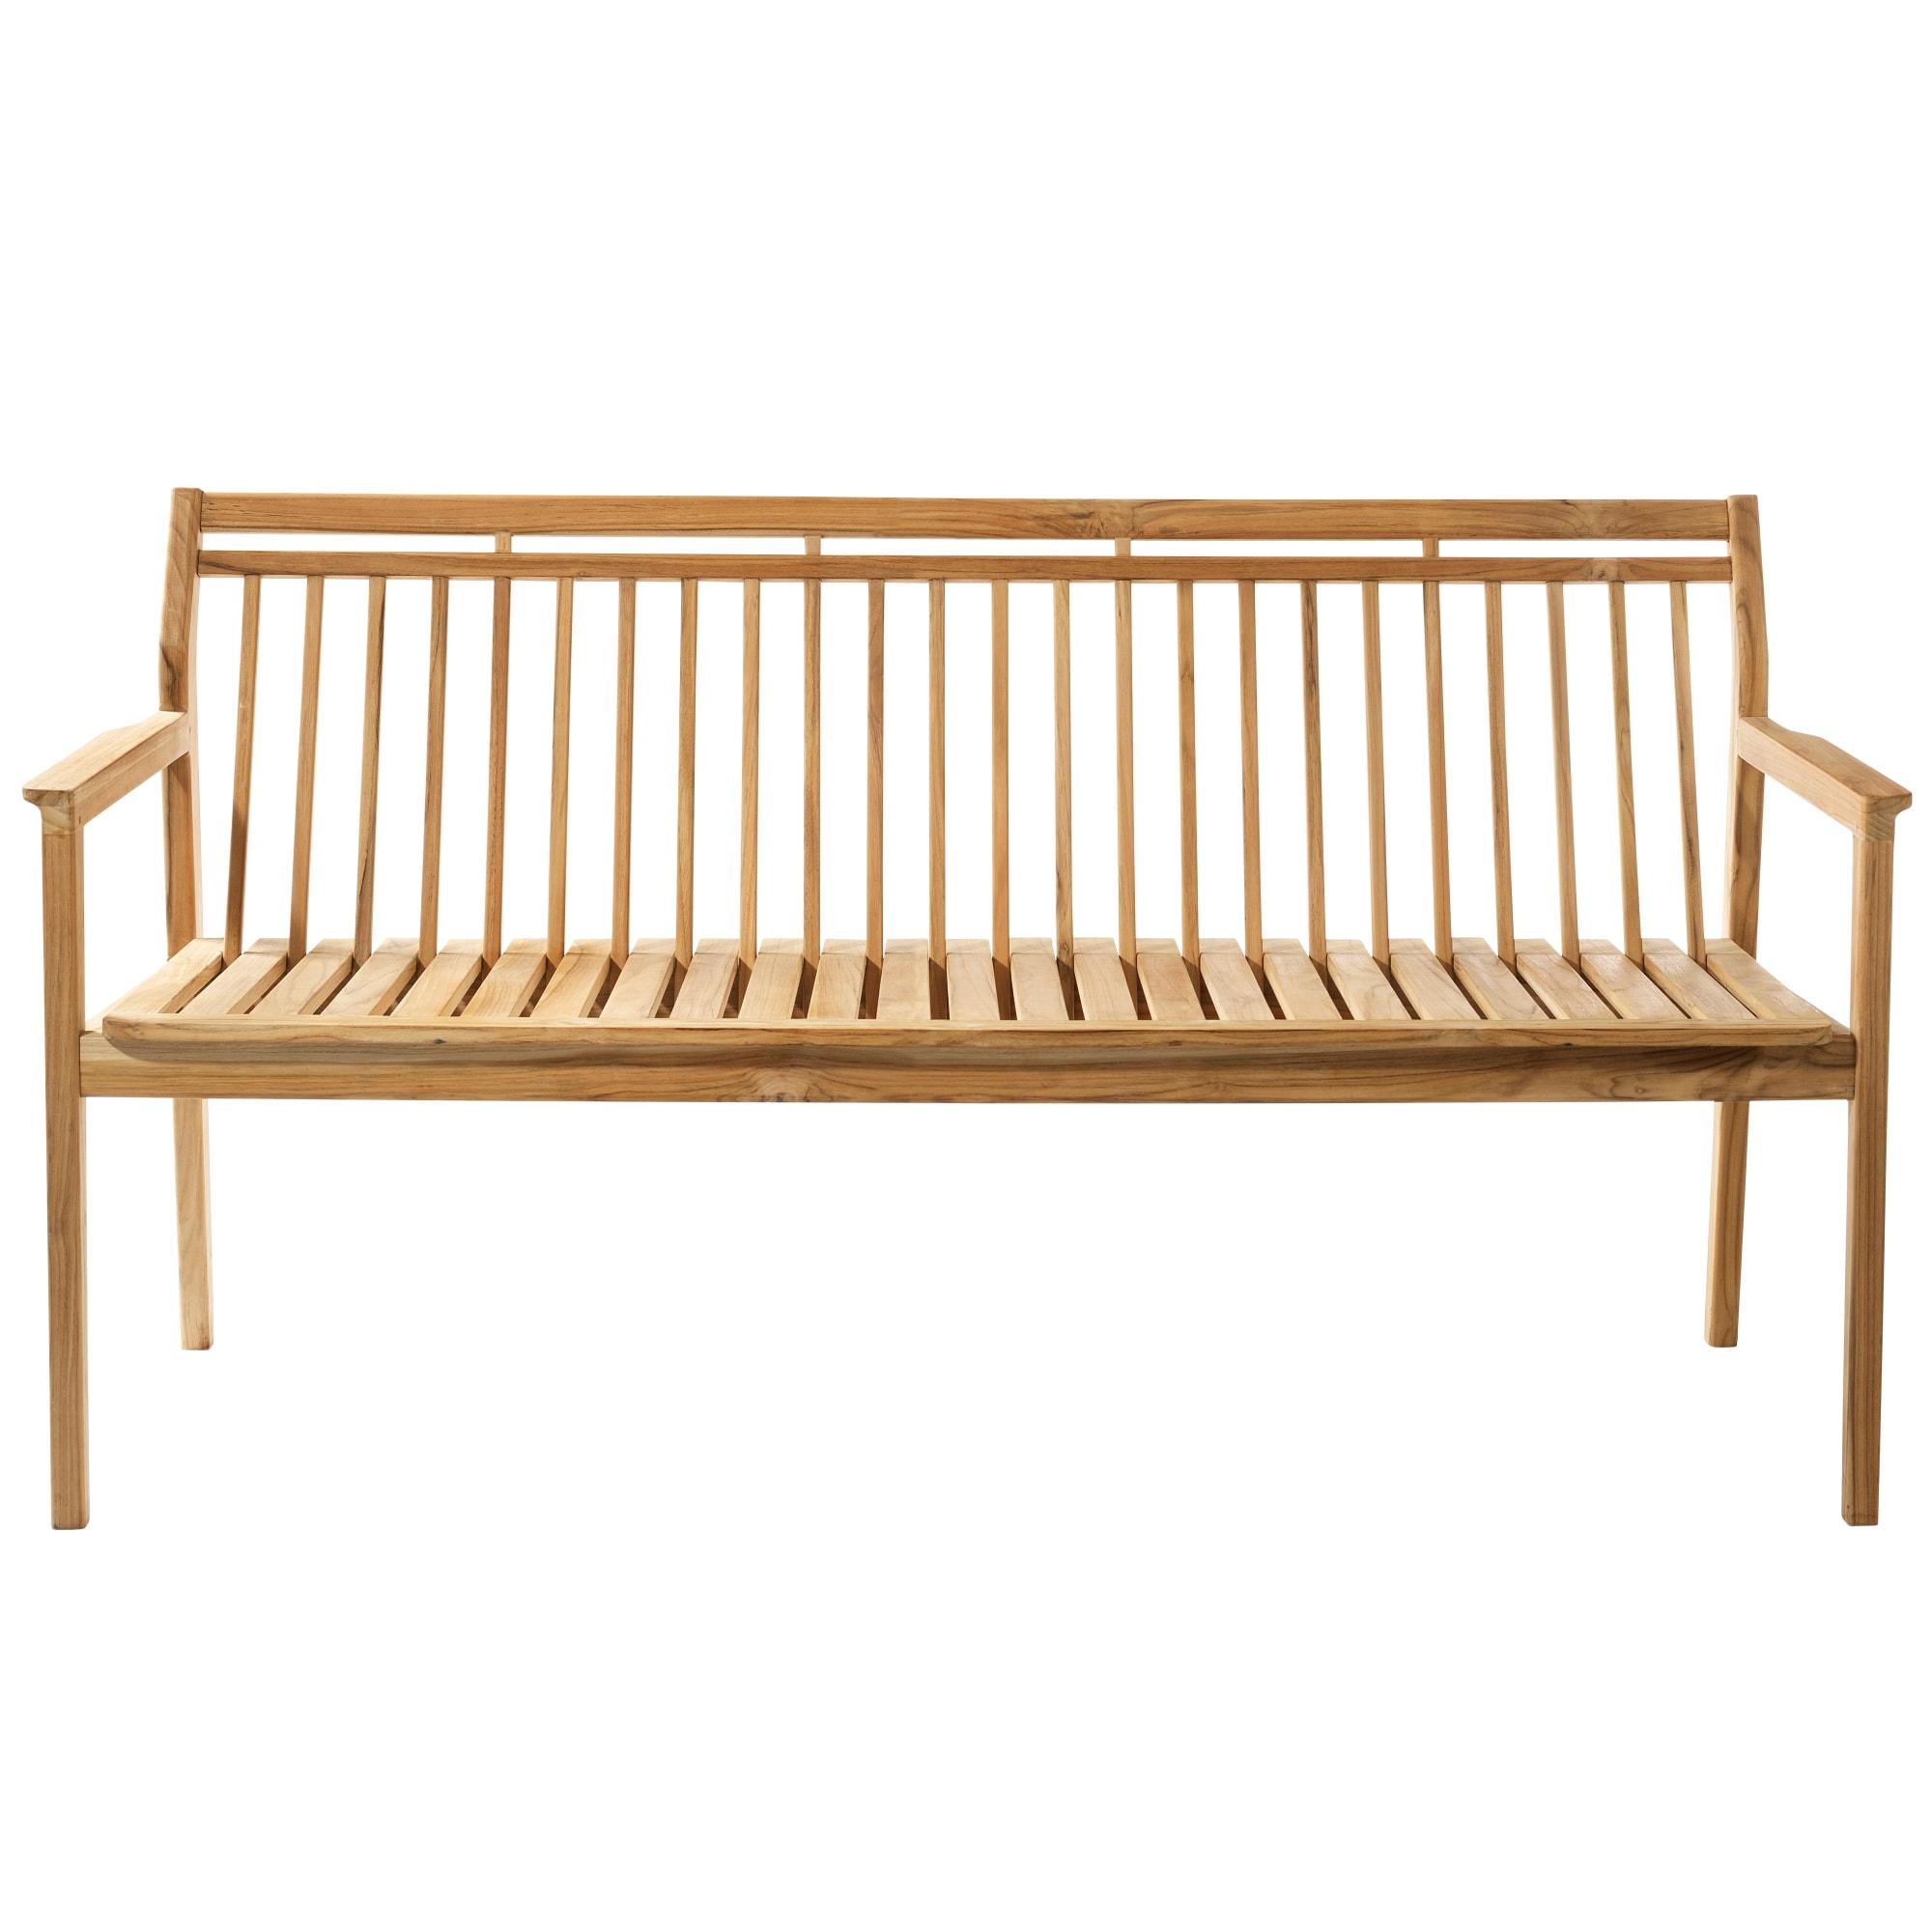 FDB Møbler - Eksklusivt havemøbel i teak